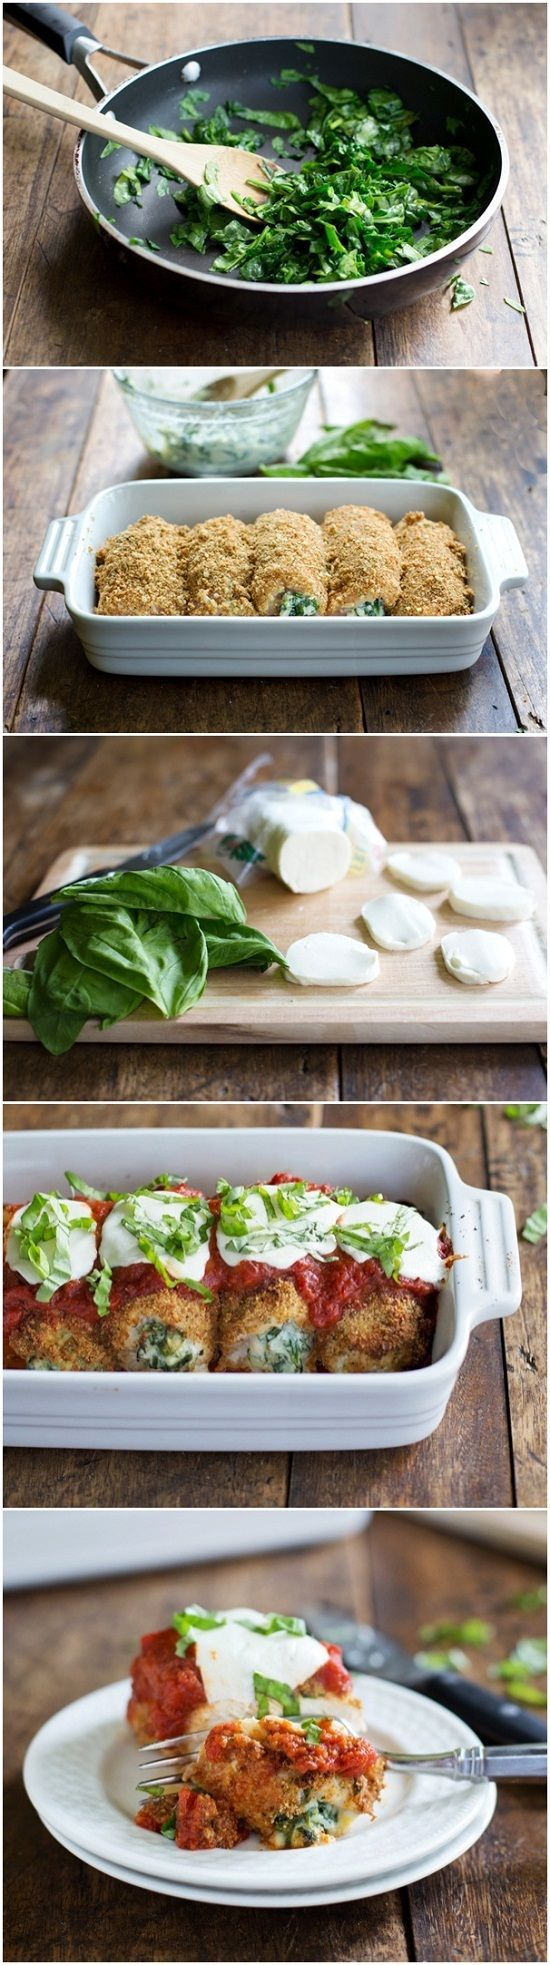 Baked Mozzarella Chicken Rolls. Just need an alternative to breadcrumbs!